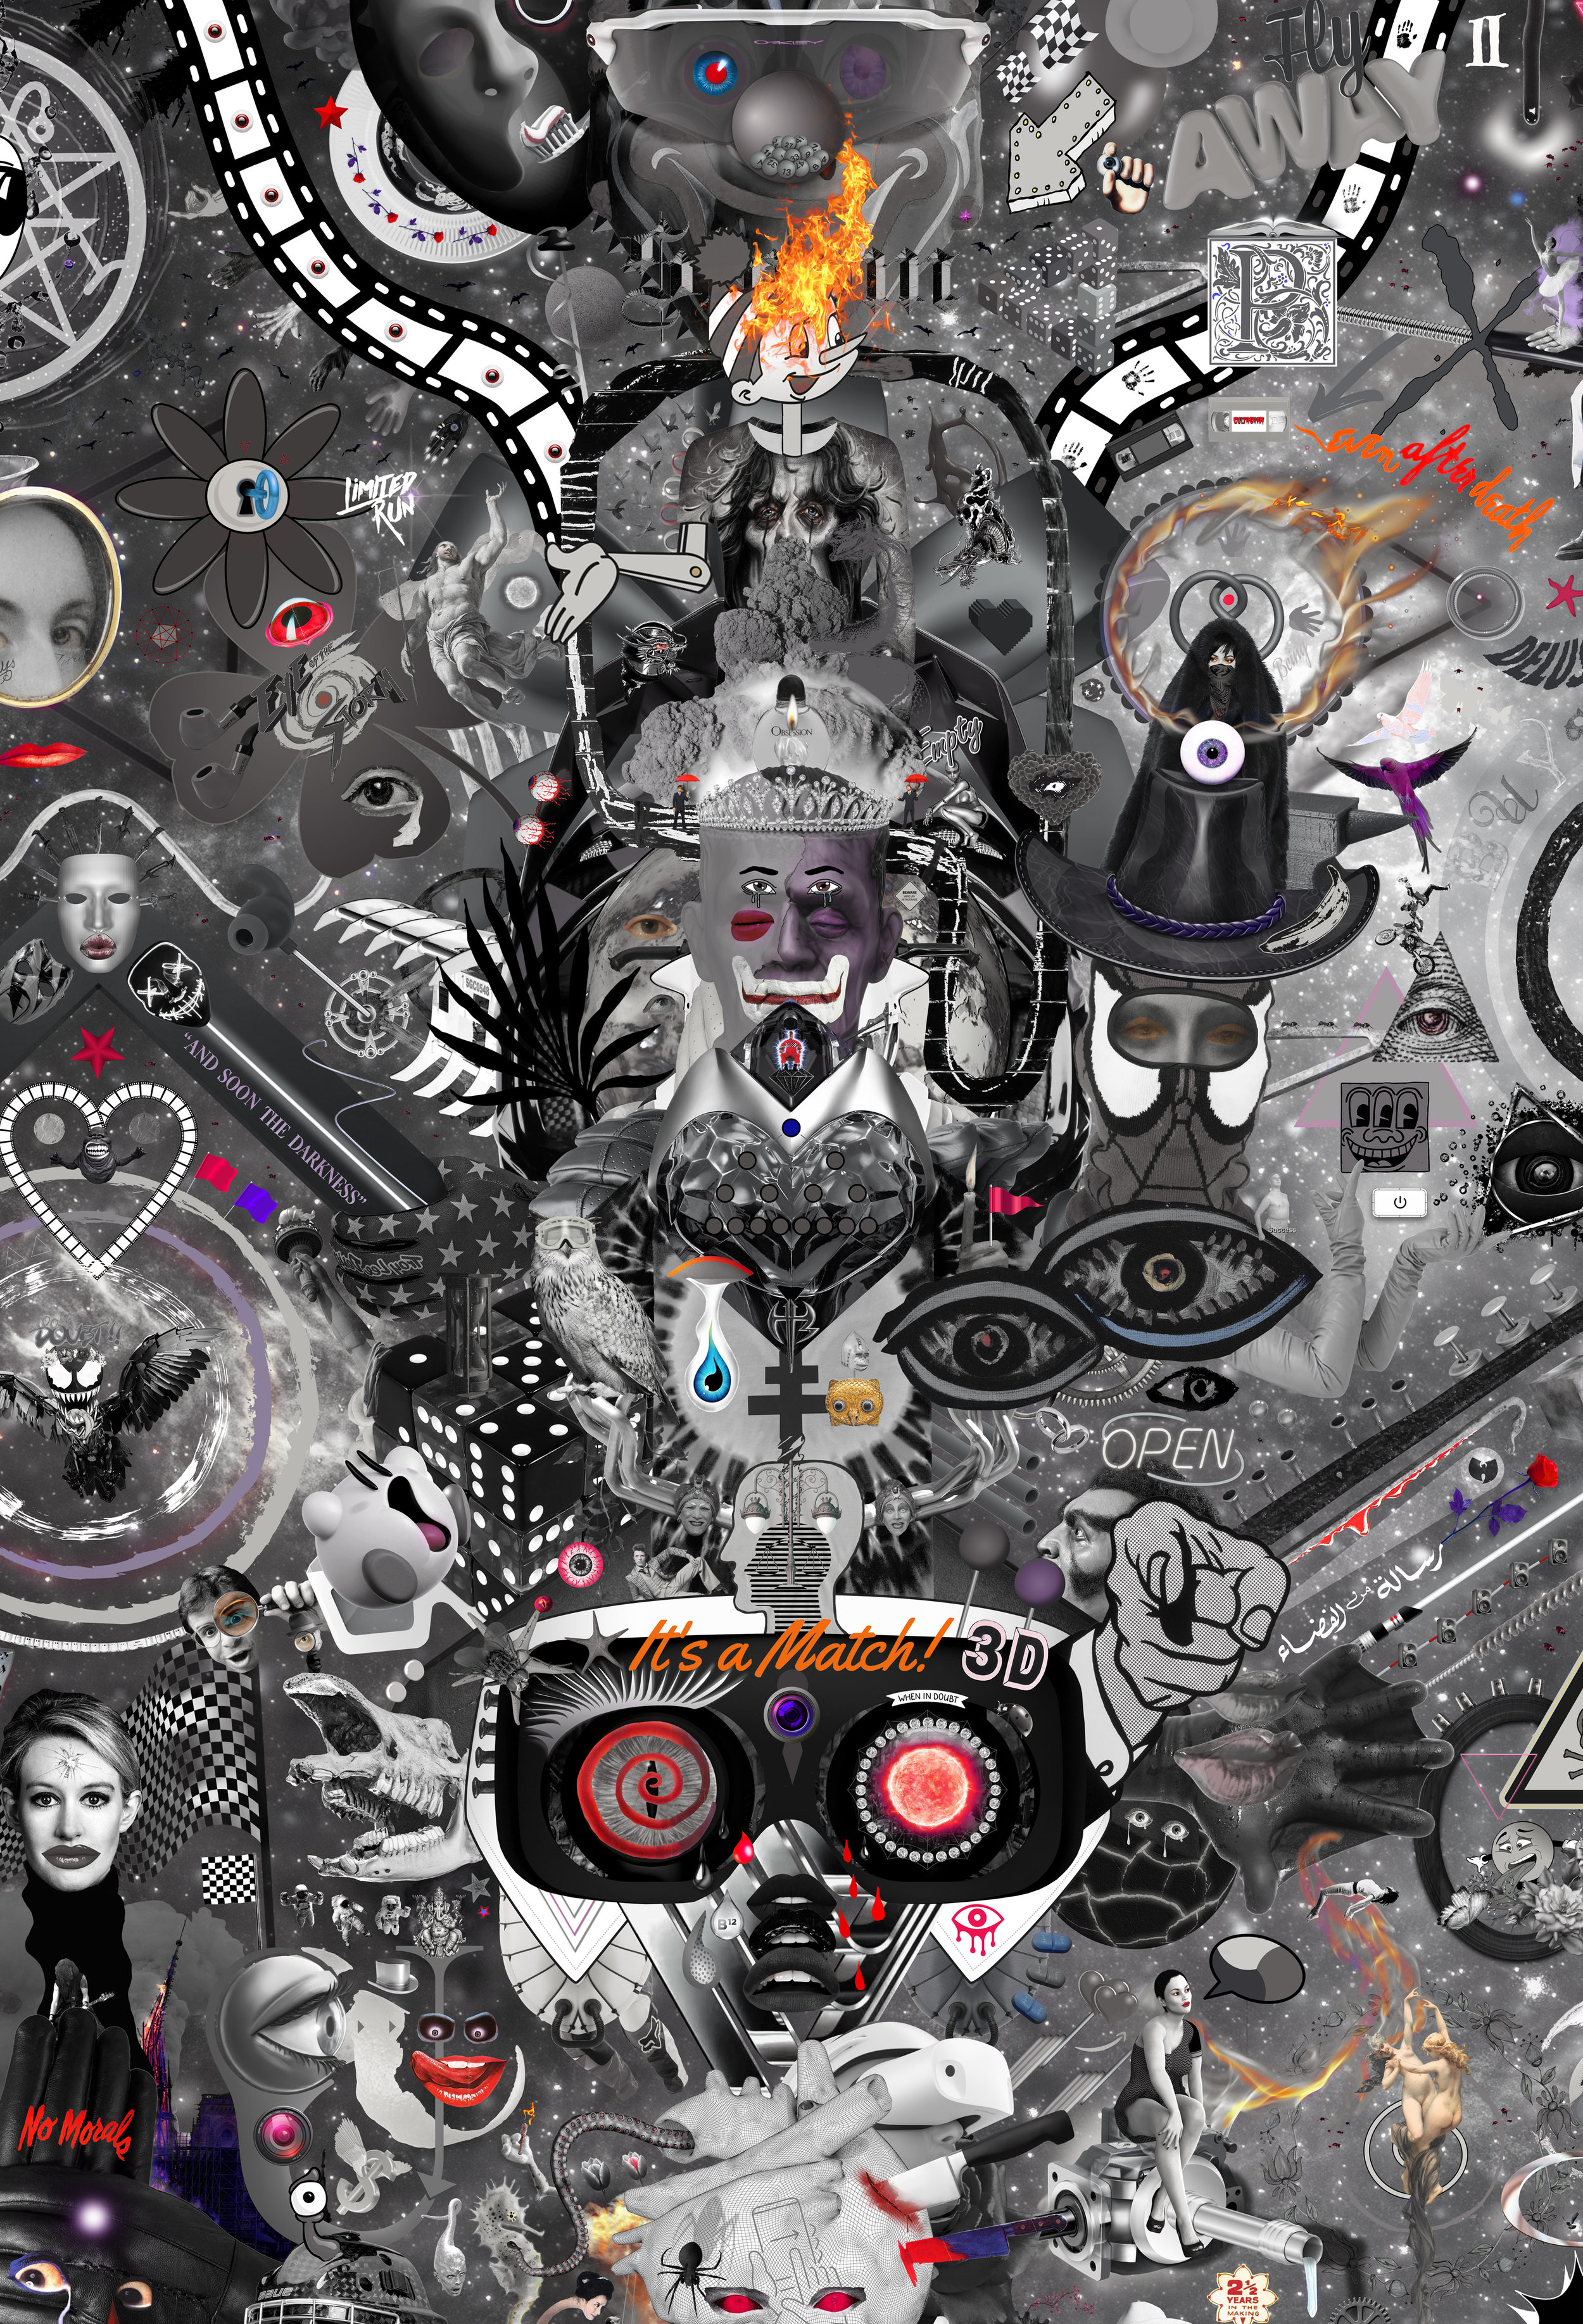 Case Simmons, Temple 10, Pigment Print, Digital Collage, Digital Art, Photoshop Collage, Contemporary Collage, M+B Gallery, Los Angeles, Art, Fine Art